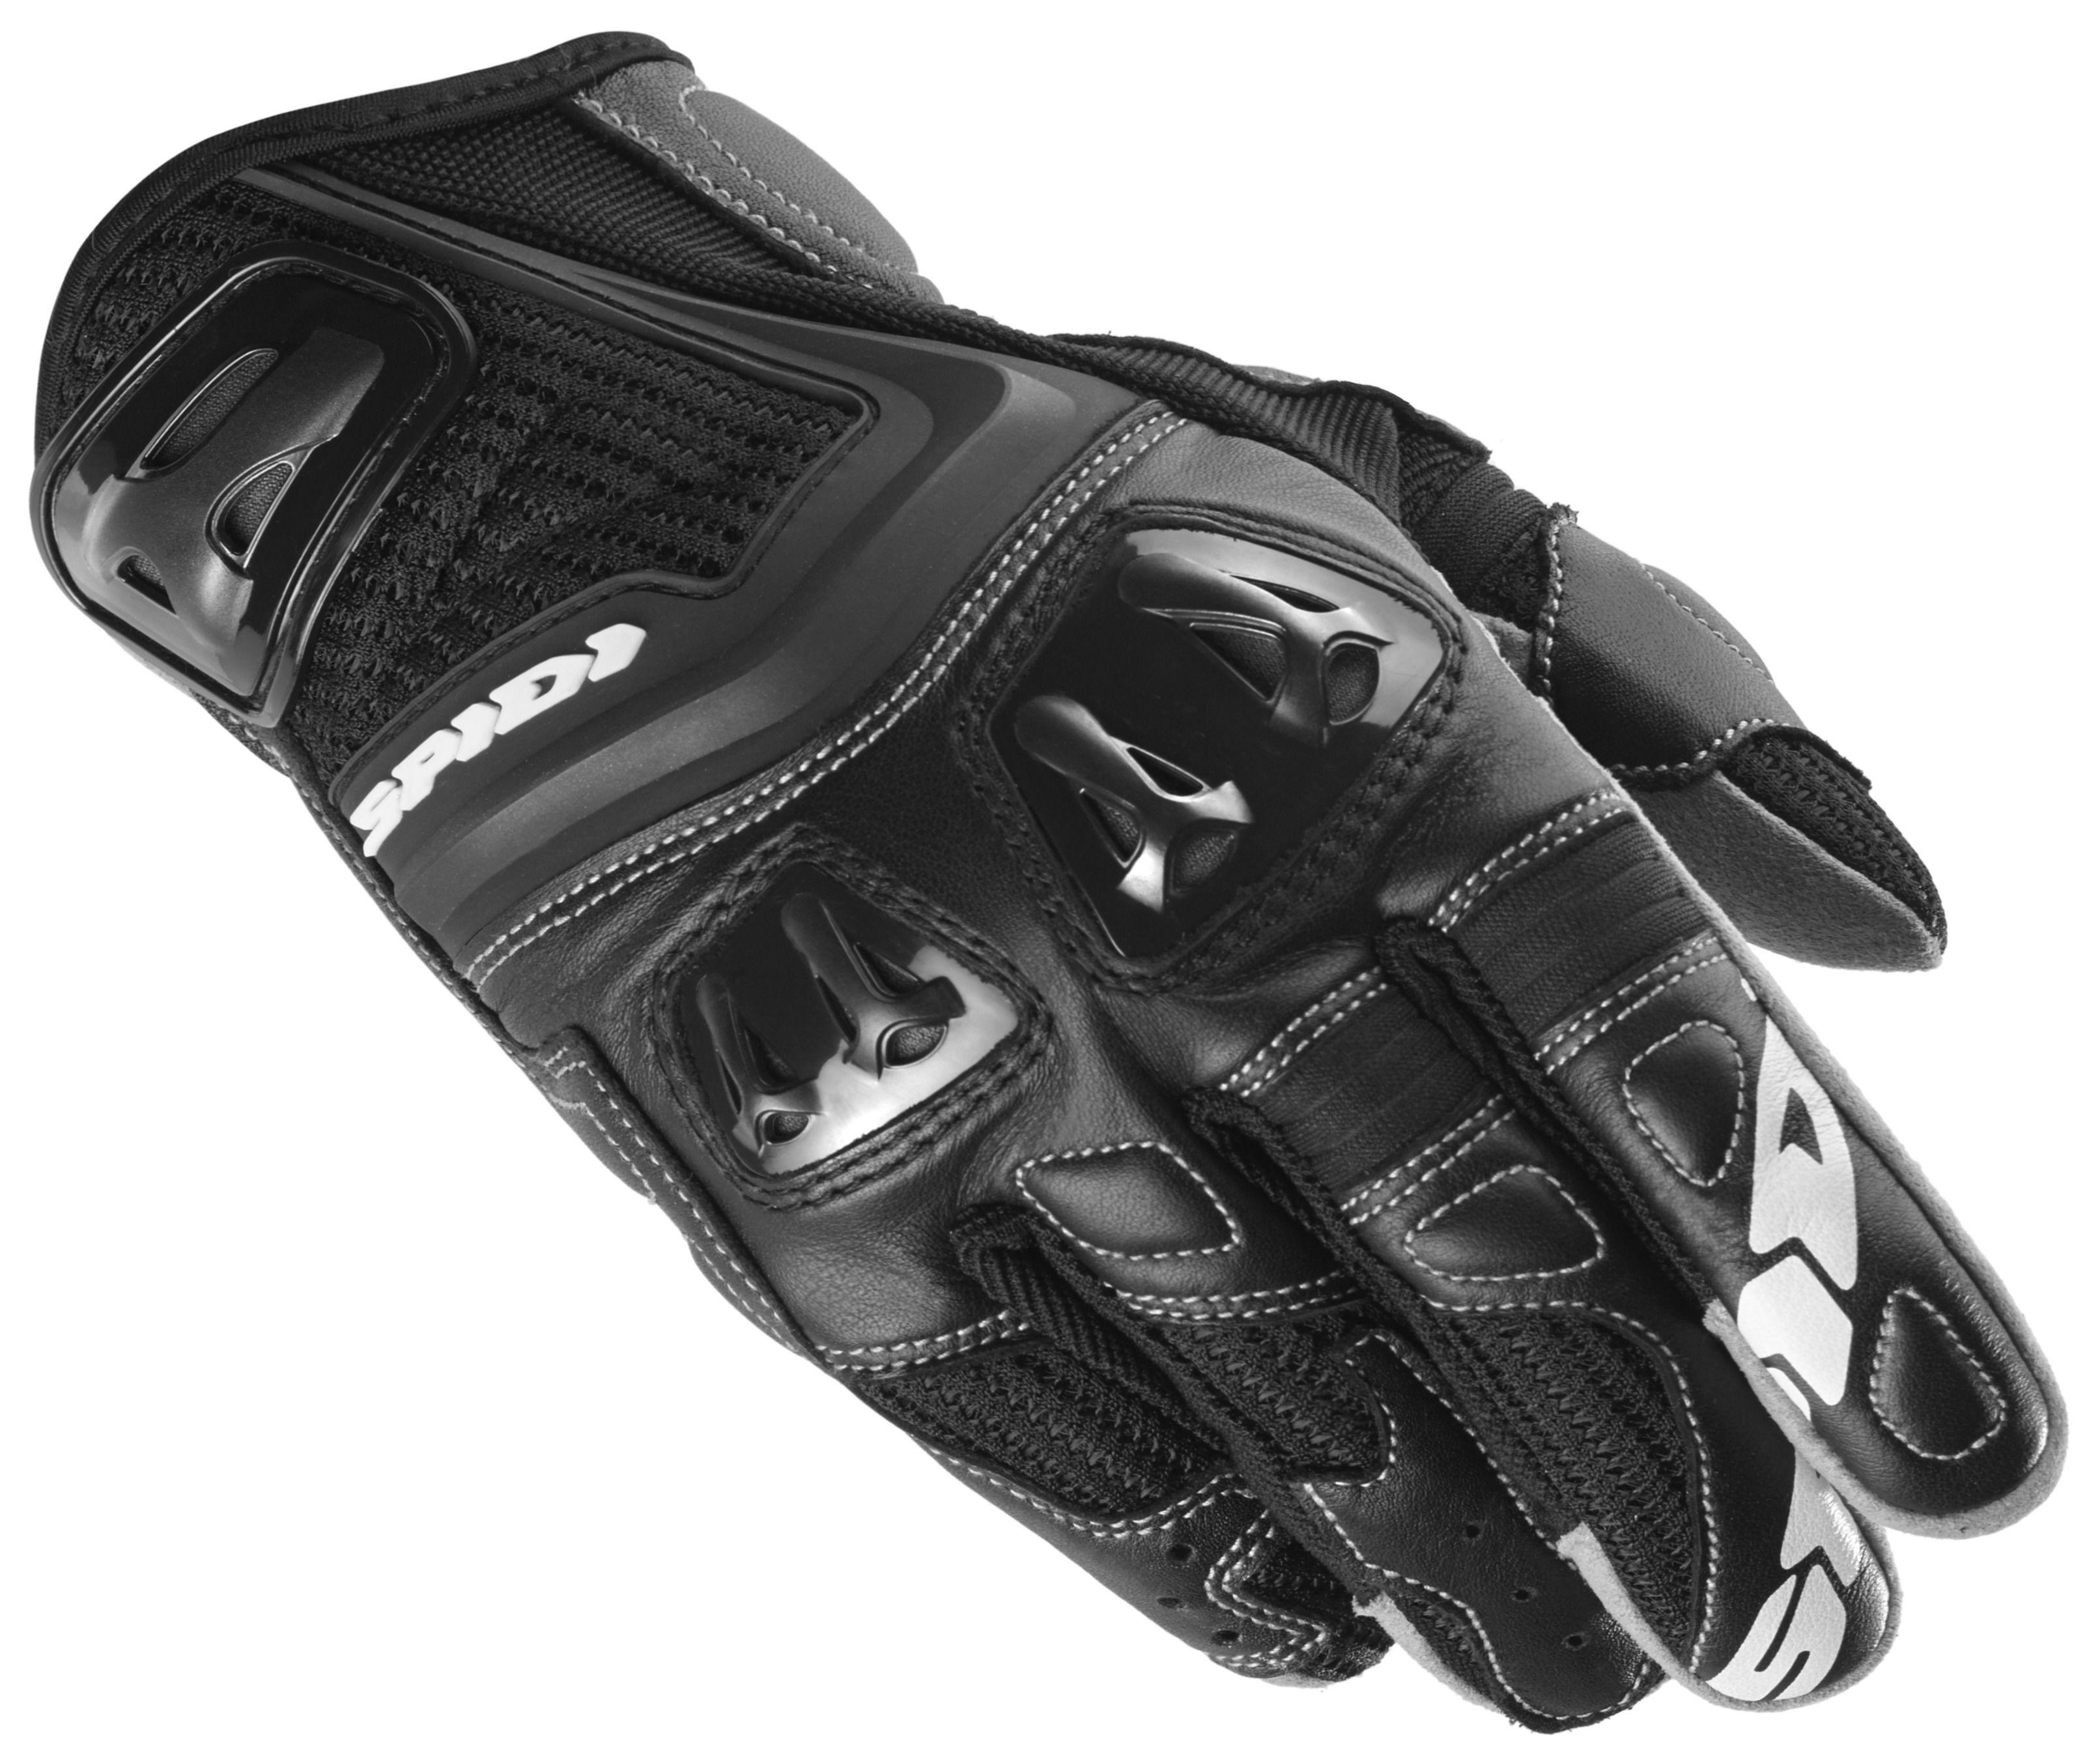 Motorcycle gloves xl - Motorcycle Gloves Xl